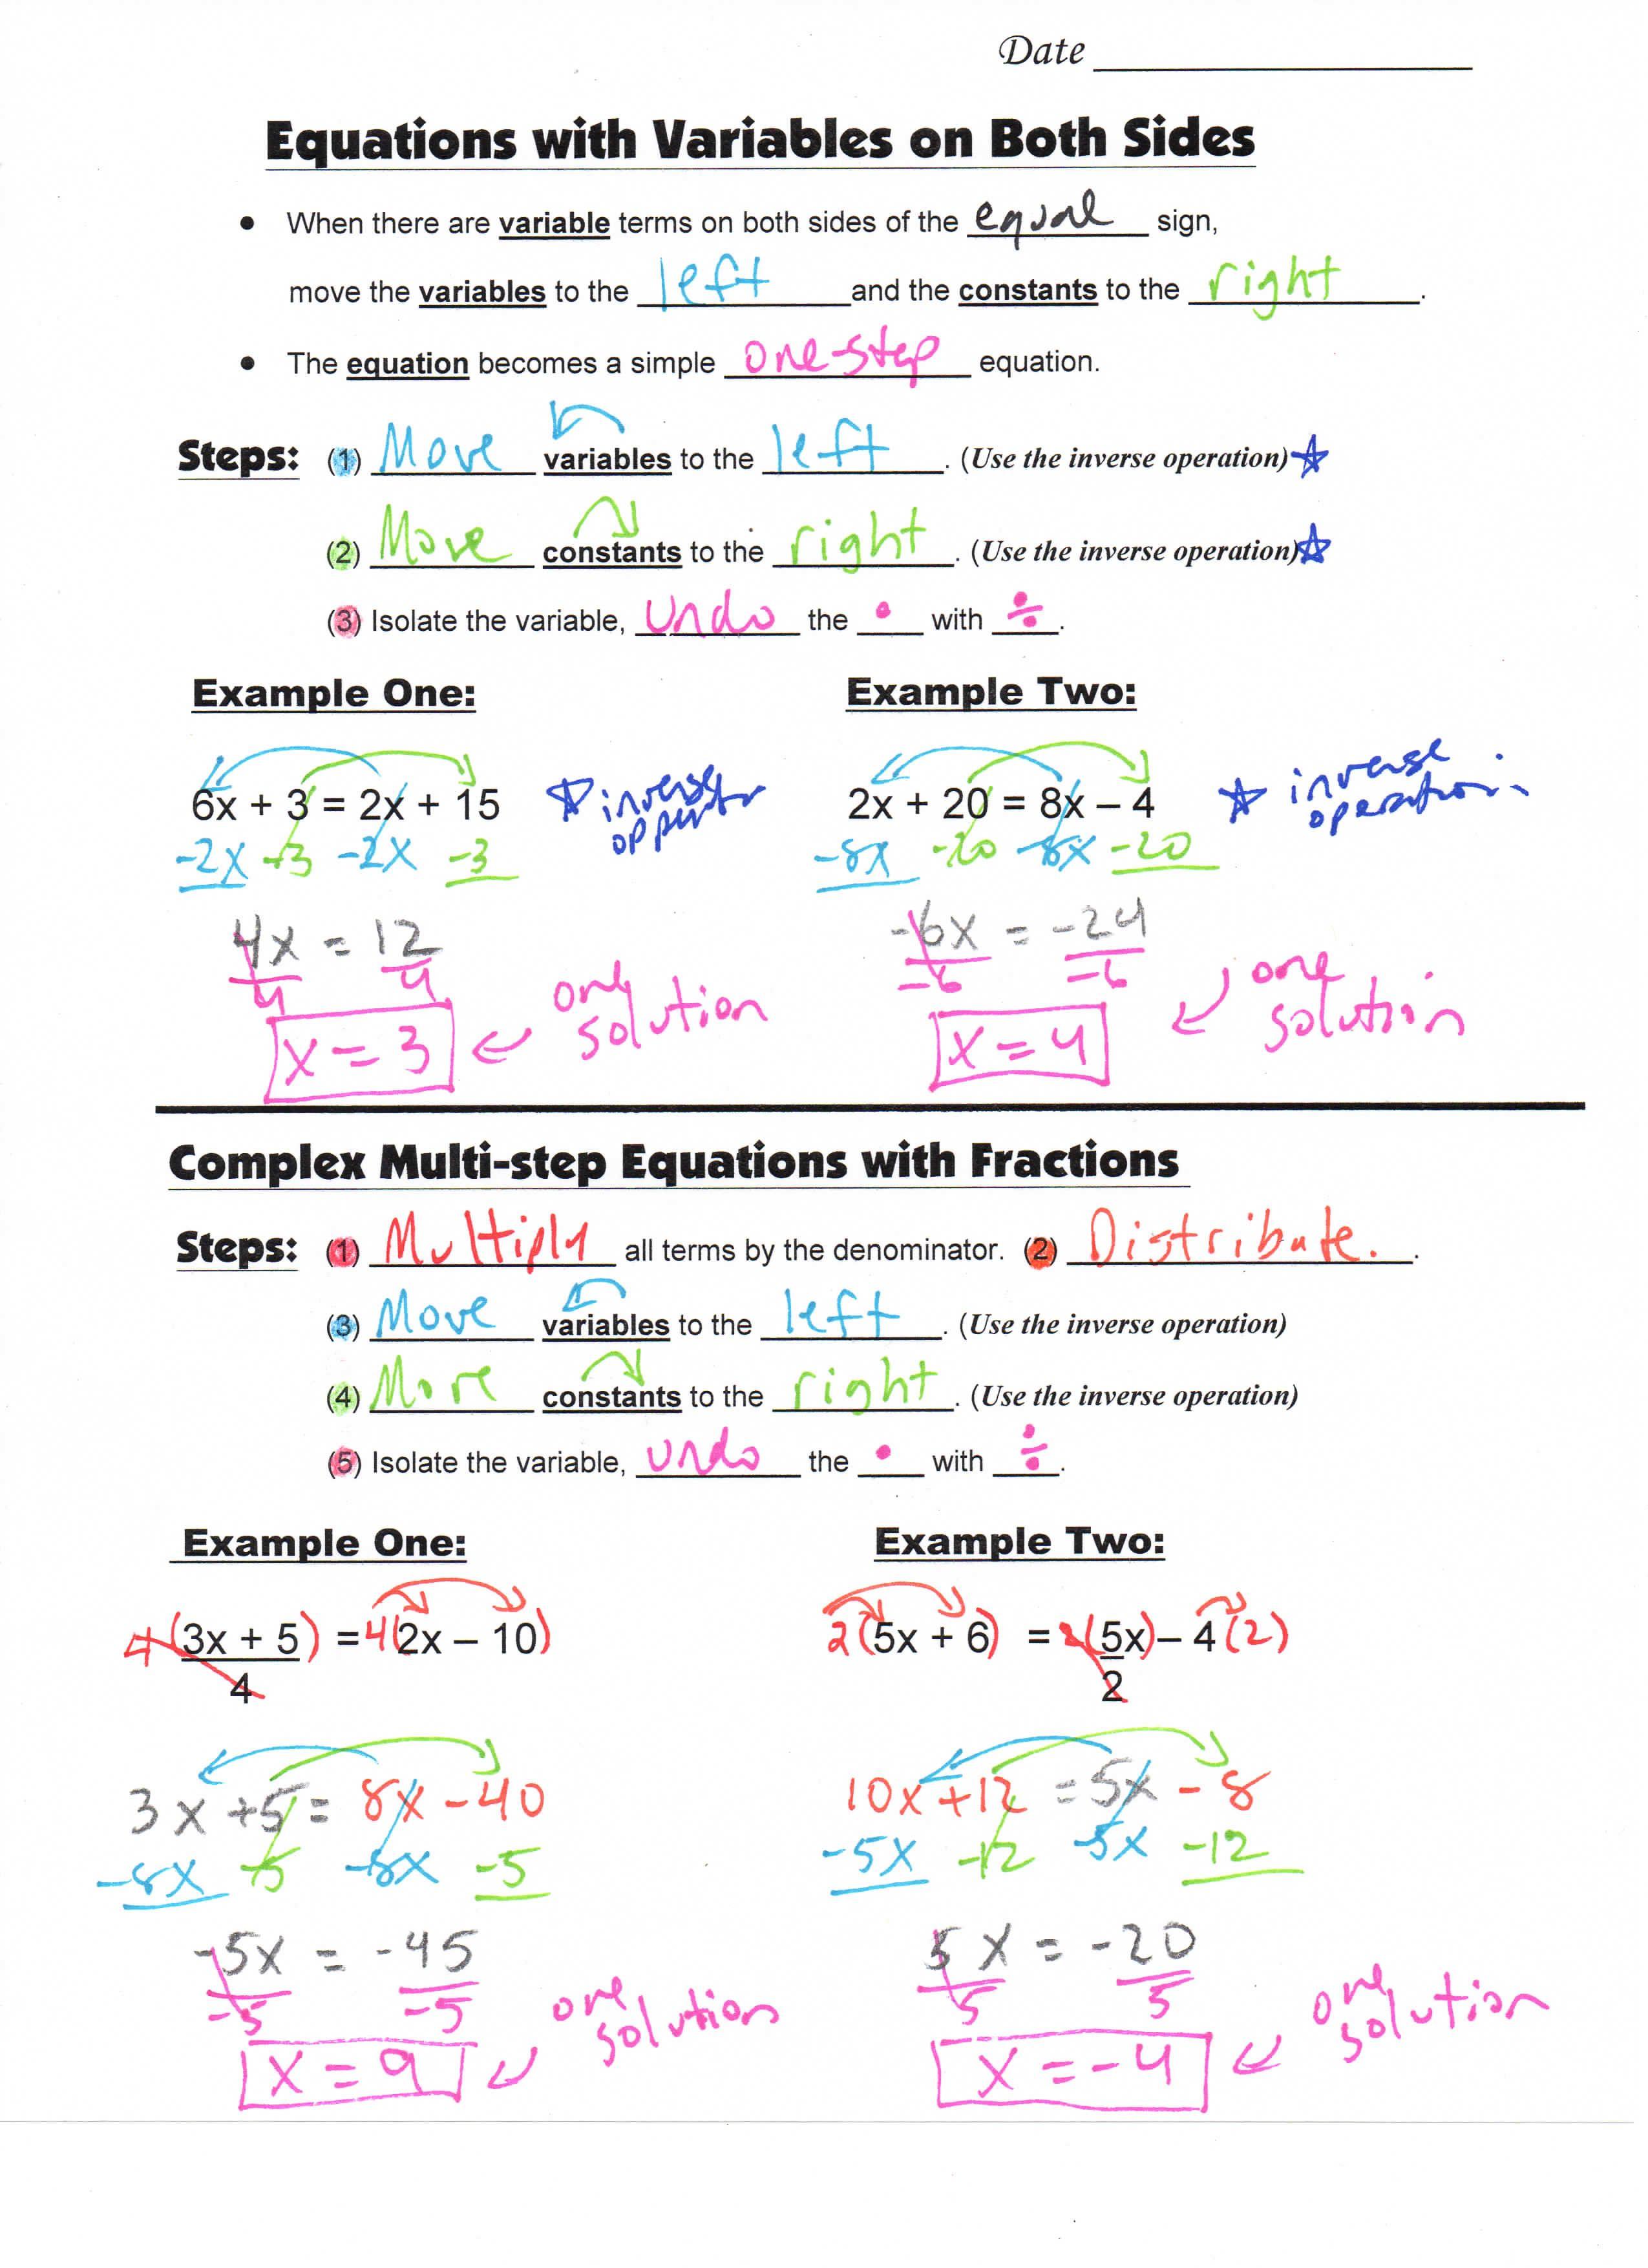 S Teacherspayteachers Product Math 8 Guided Interactive Math Notebook Page